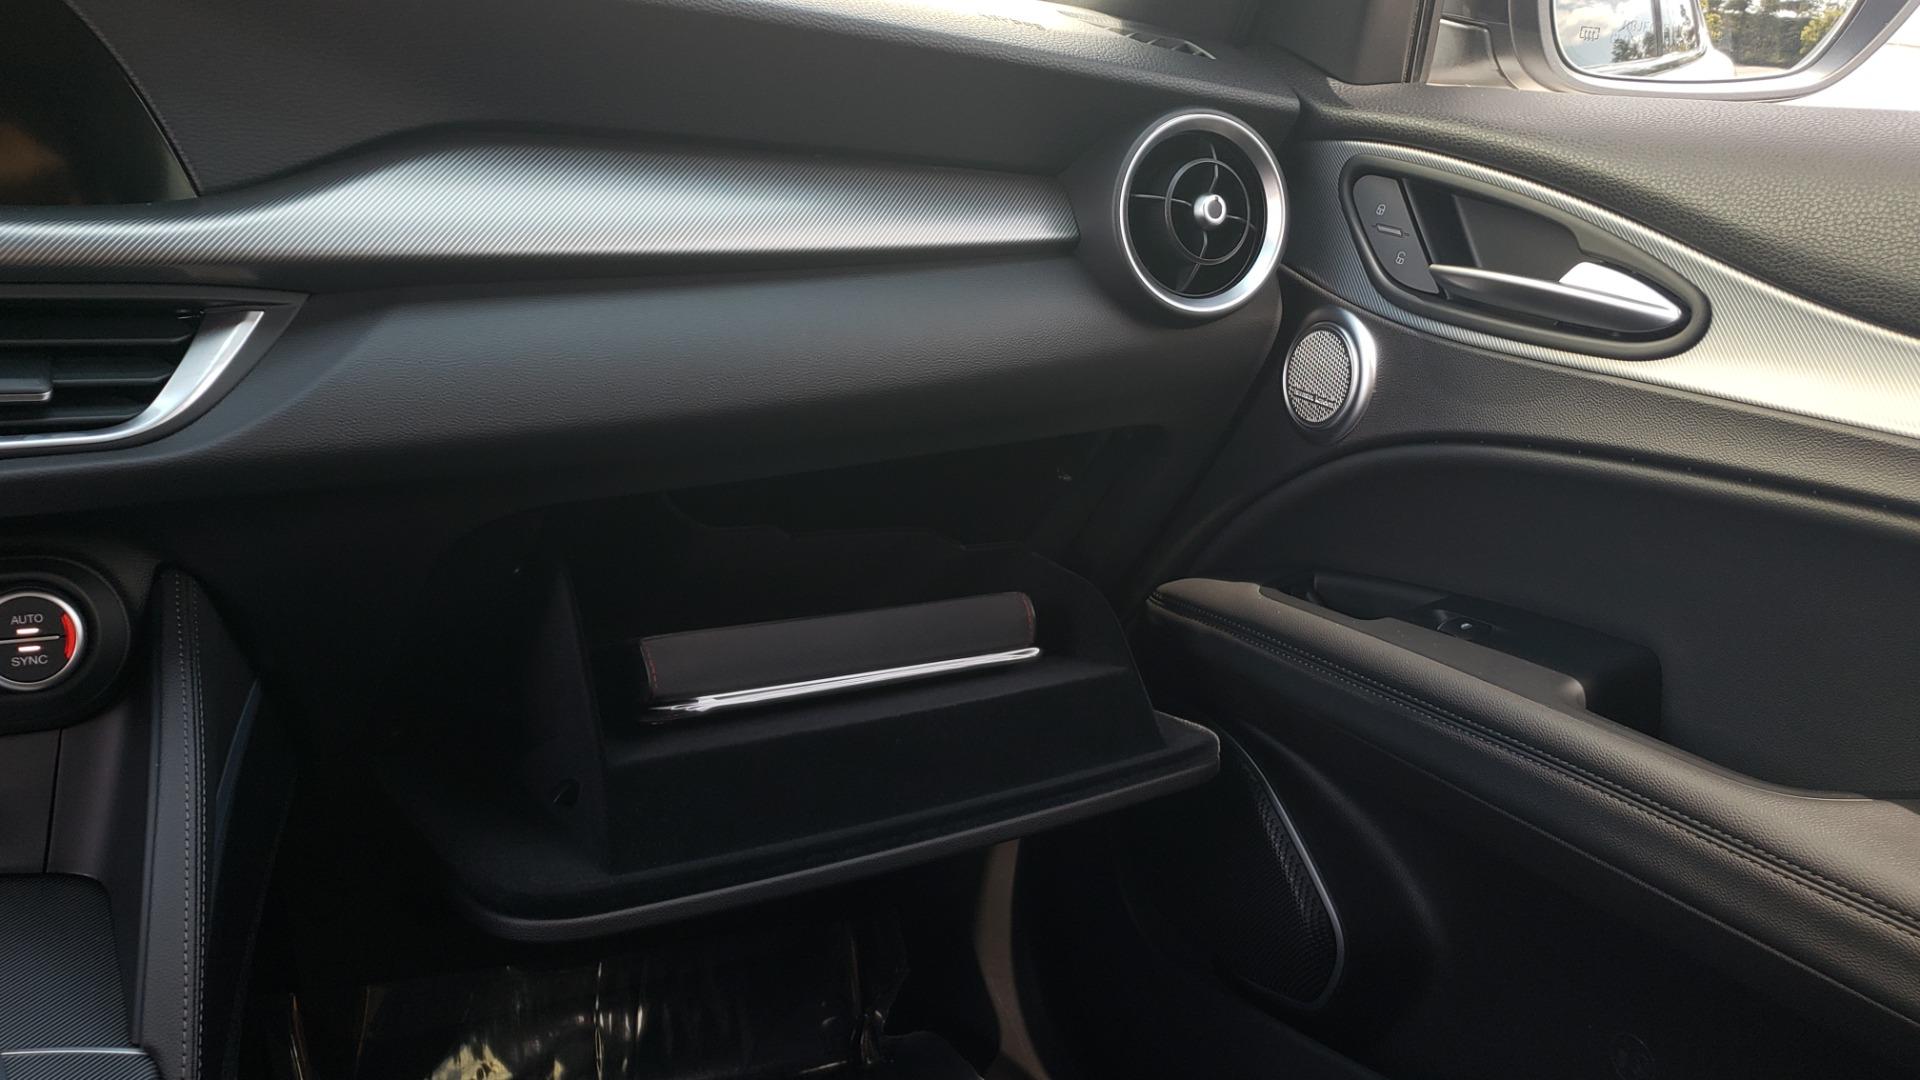 Used 2019 Alfa Romeo STELVIO TI SPORT AWD / 2.0L TURBO / 8-SPD AUTO / DRVR ASST / REARVIEW for sale $37,495 at Formula Imports in Charlotte NC 28227 56